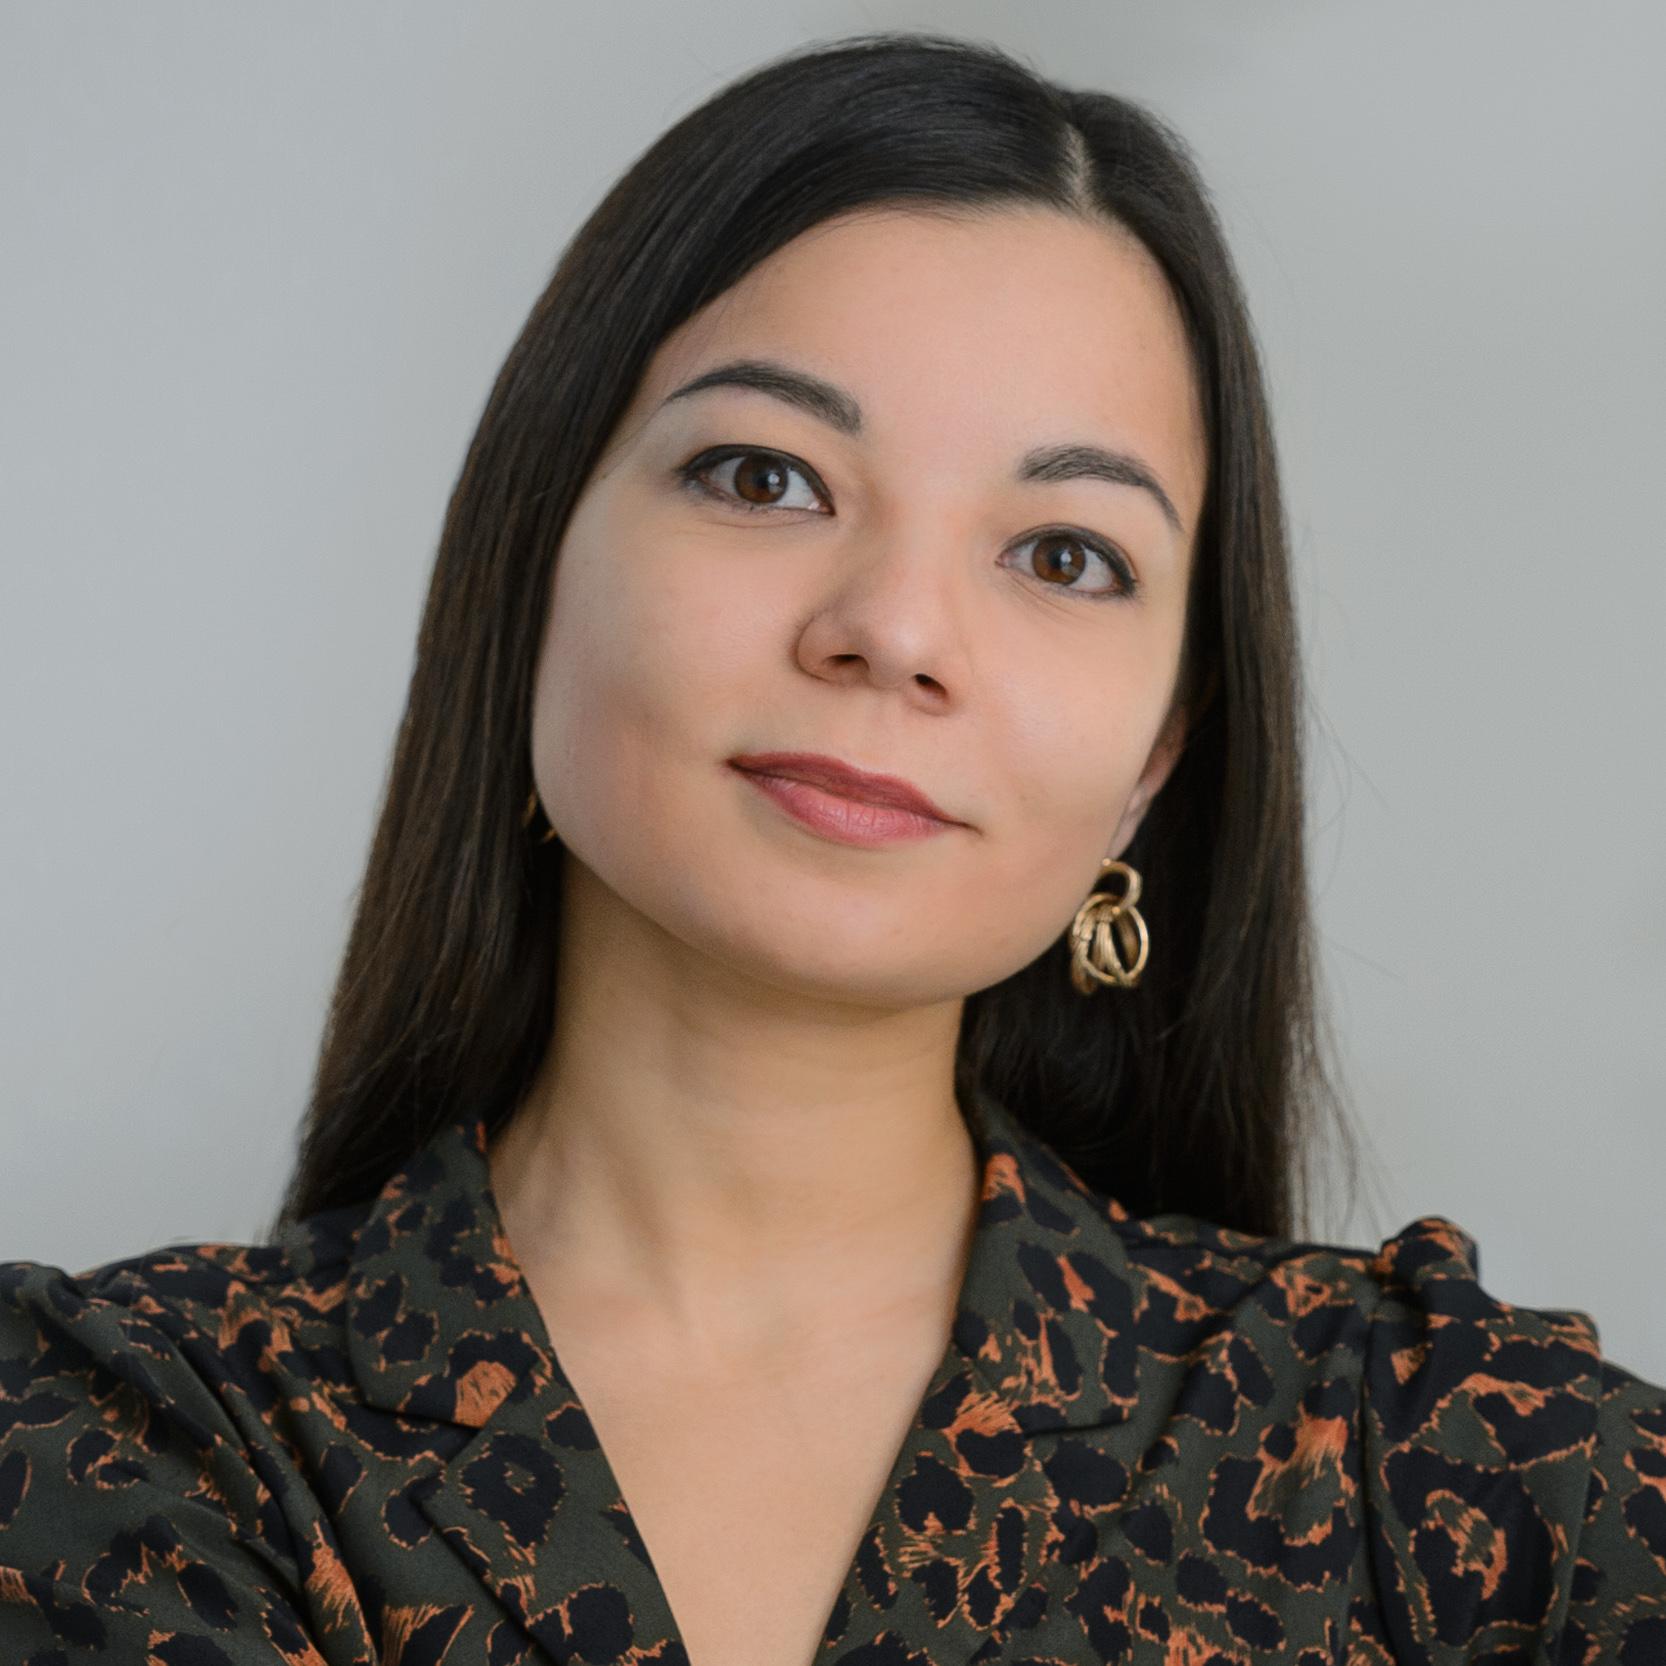 Анстасия Аширова, Байер